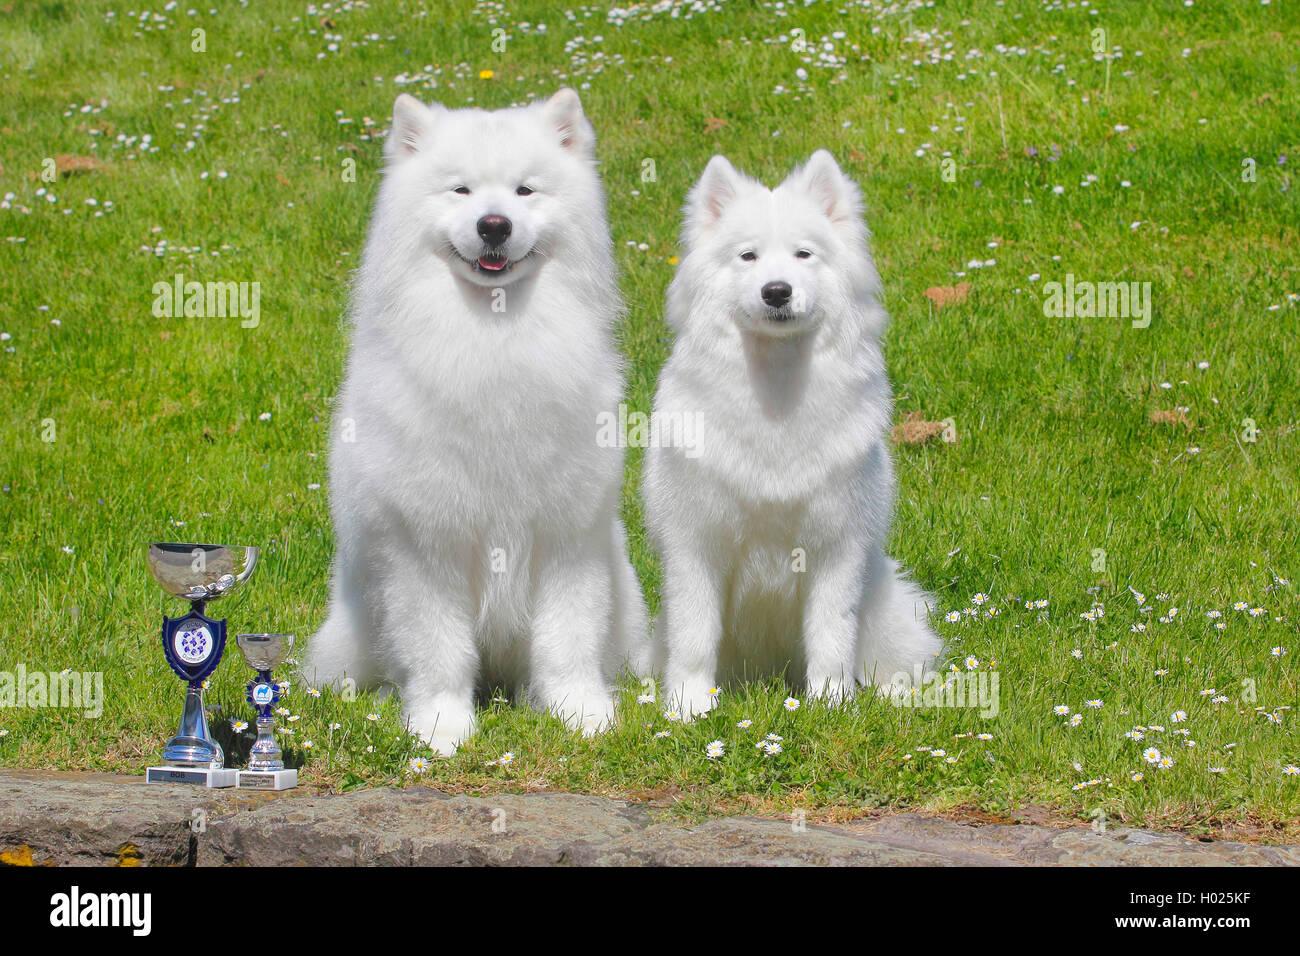 Samojede, Samojeden, Samoiedskaïa Sabaka (Canis Lupus F. Familiaris), Zwei Samojeden Nebeneinander Auf der Stockbild